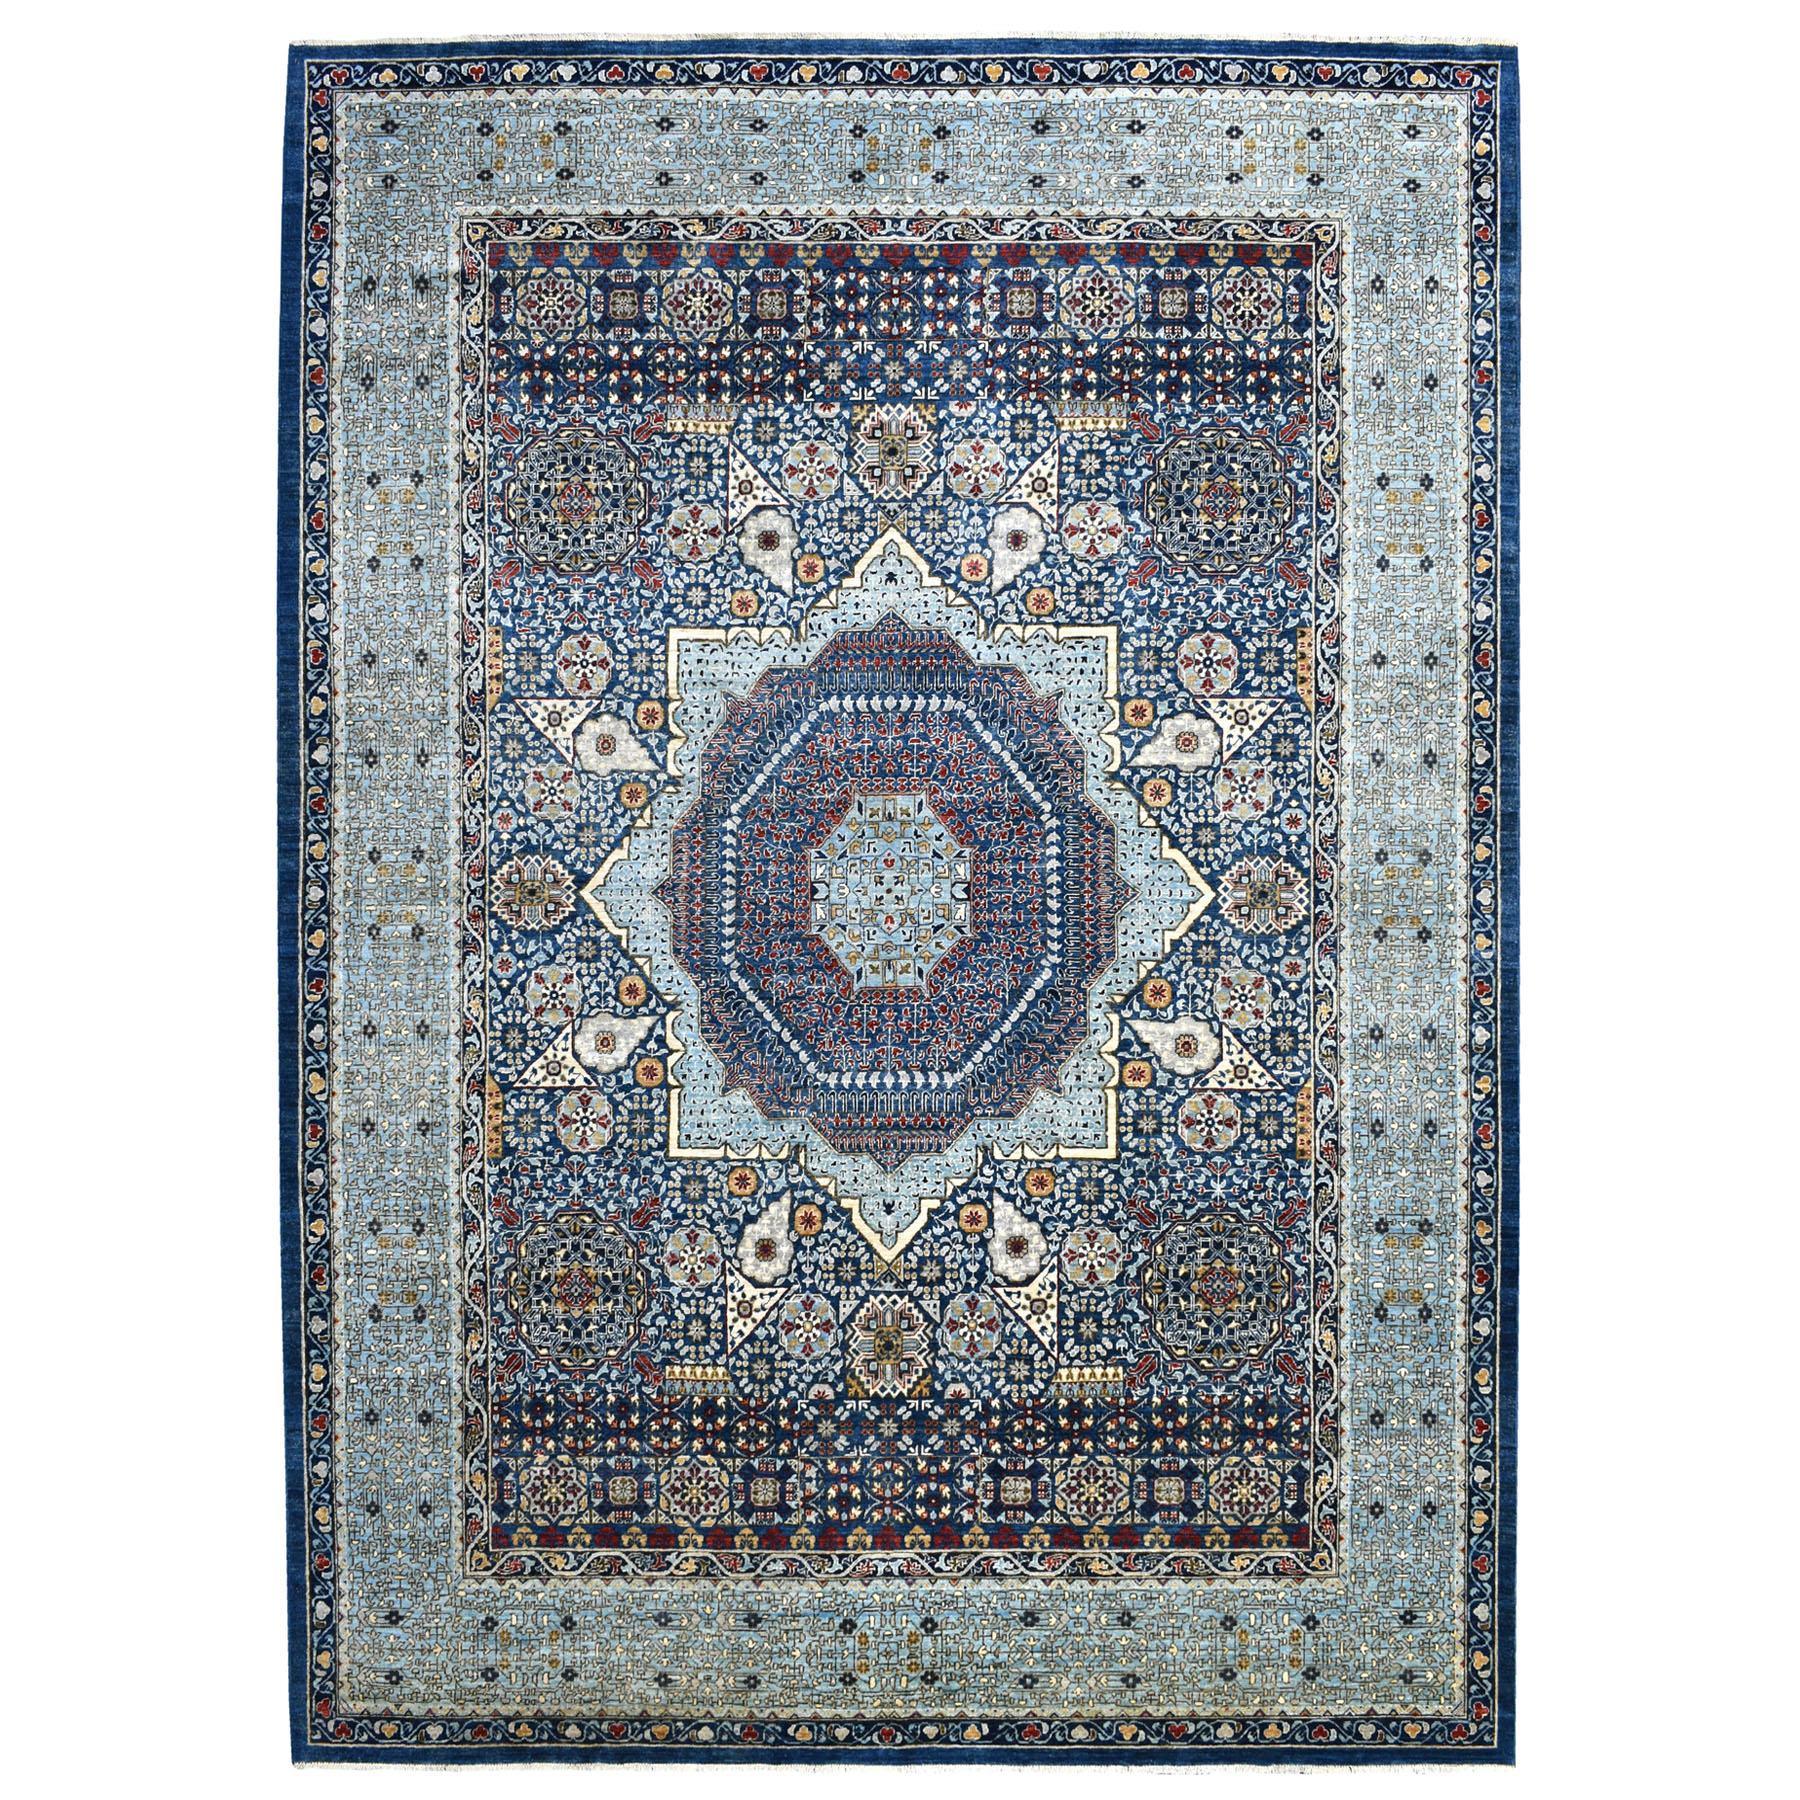 9'x12' Blue Fine Peshawar Mamluk Design With Denser Weave Shiny Wool Even Pile Hand Knotted Oriental Rug